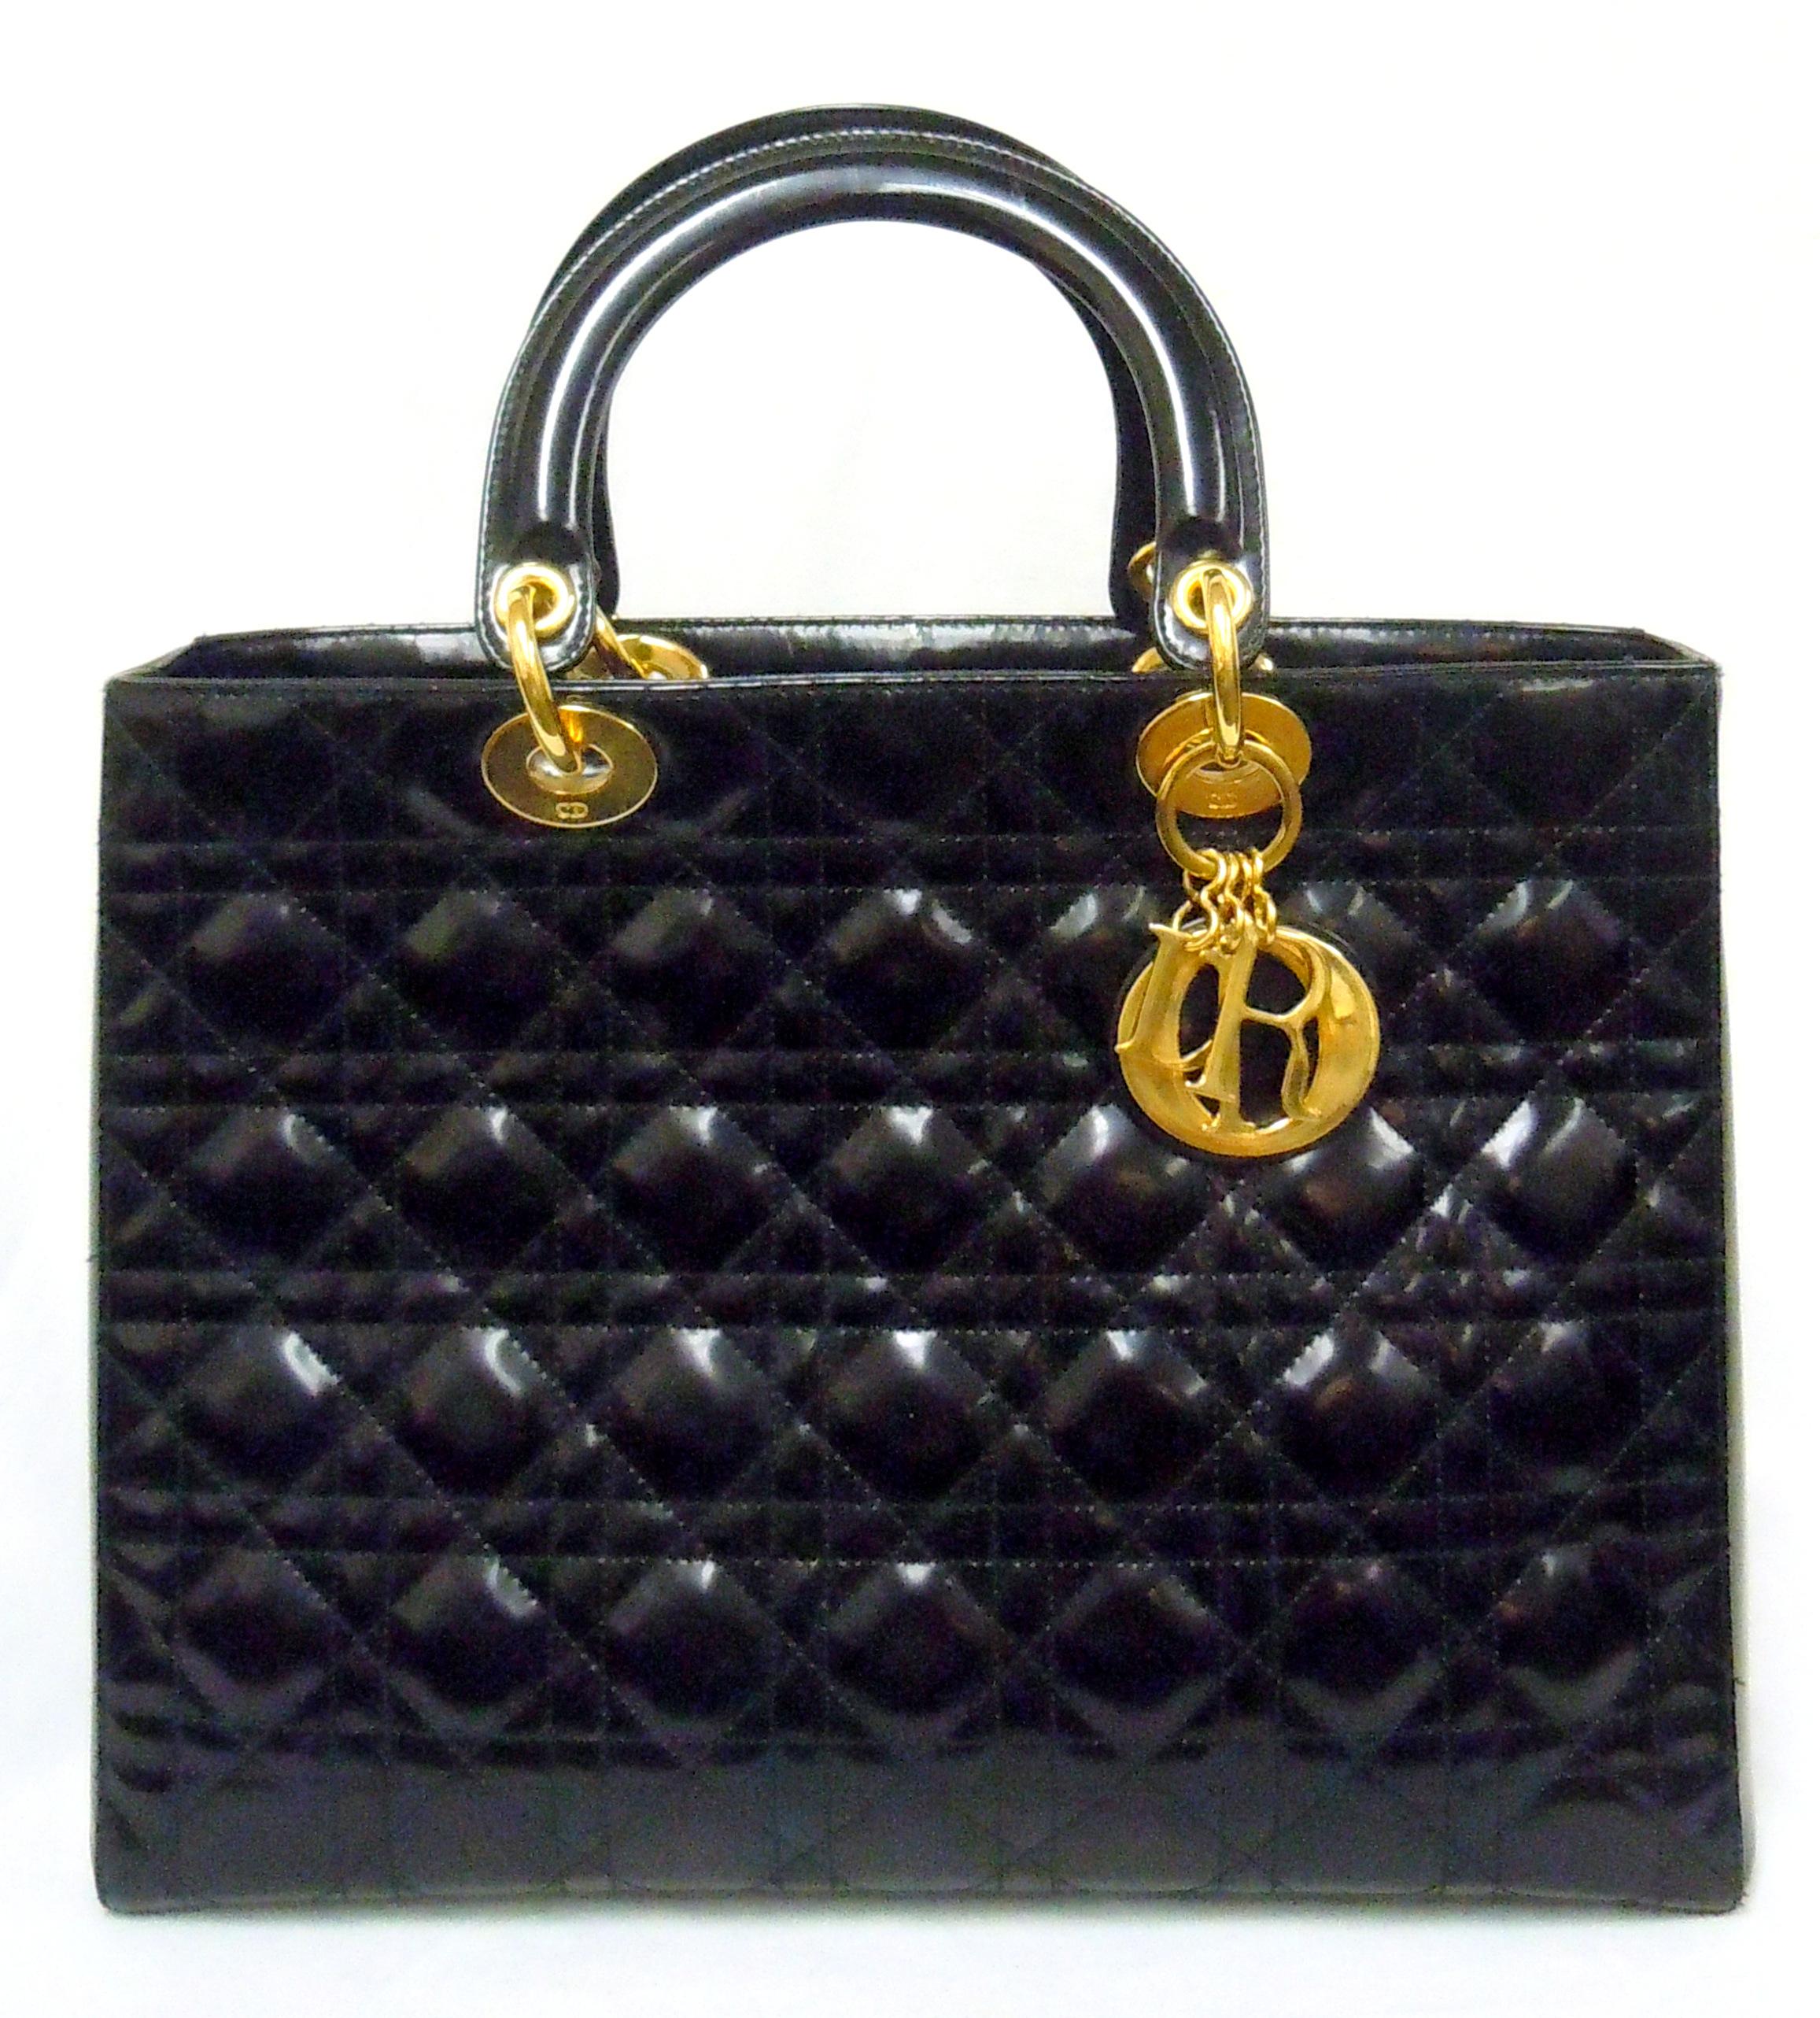 Christian Dior- Lady Dior Tote